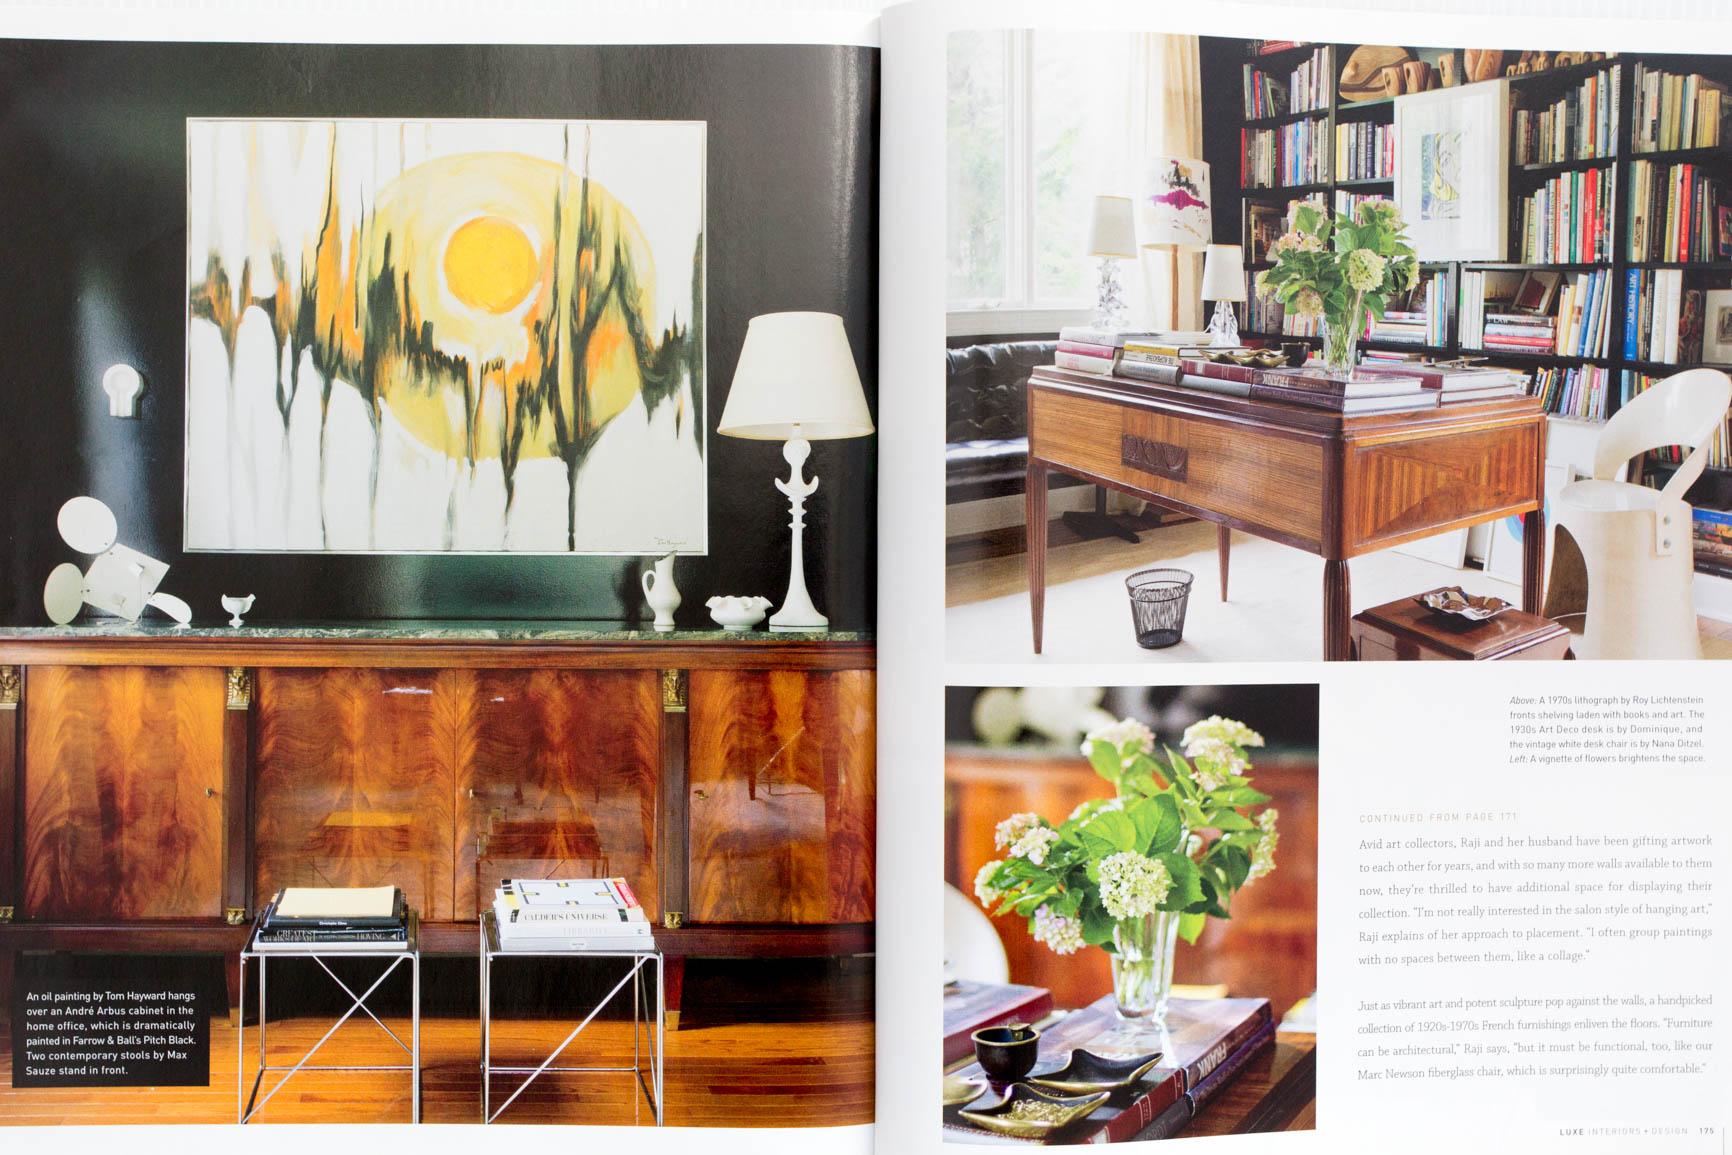 luxe-magazine-office-dc-interior-design.jpg